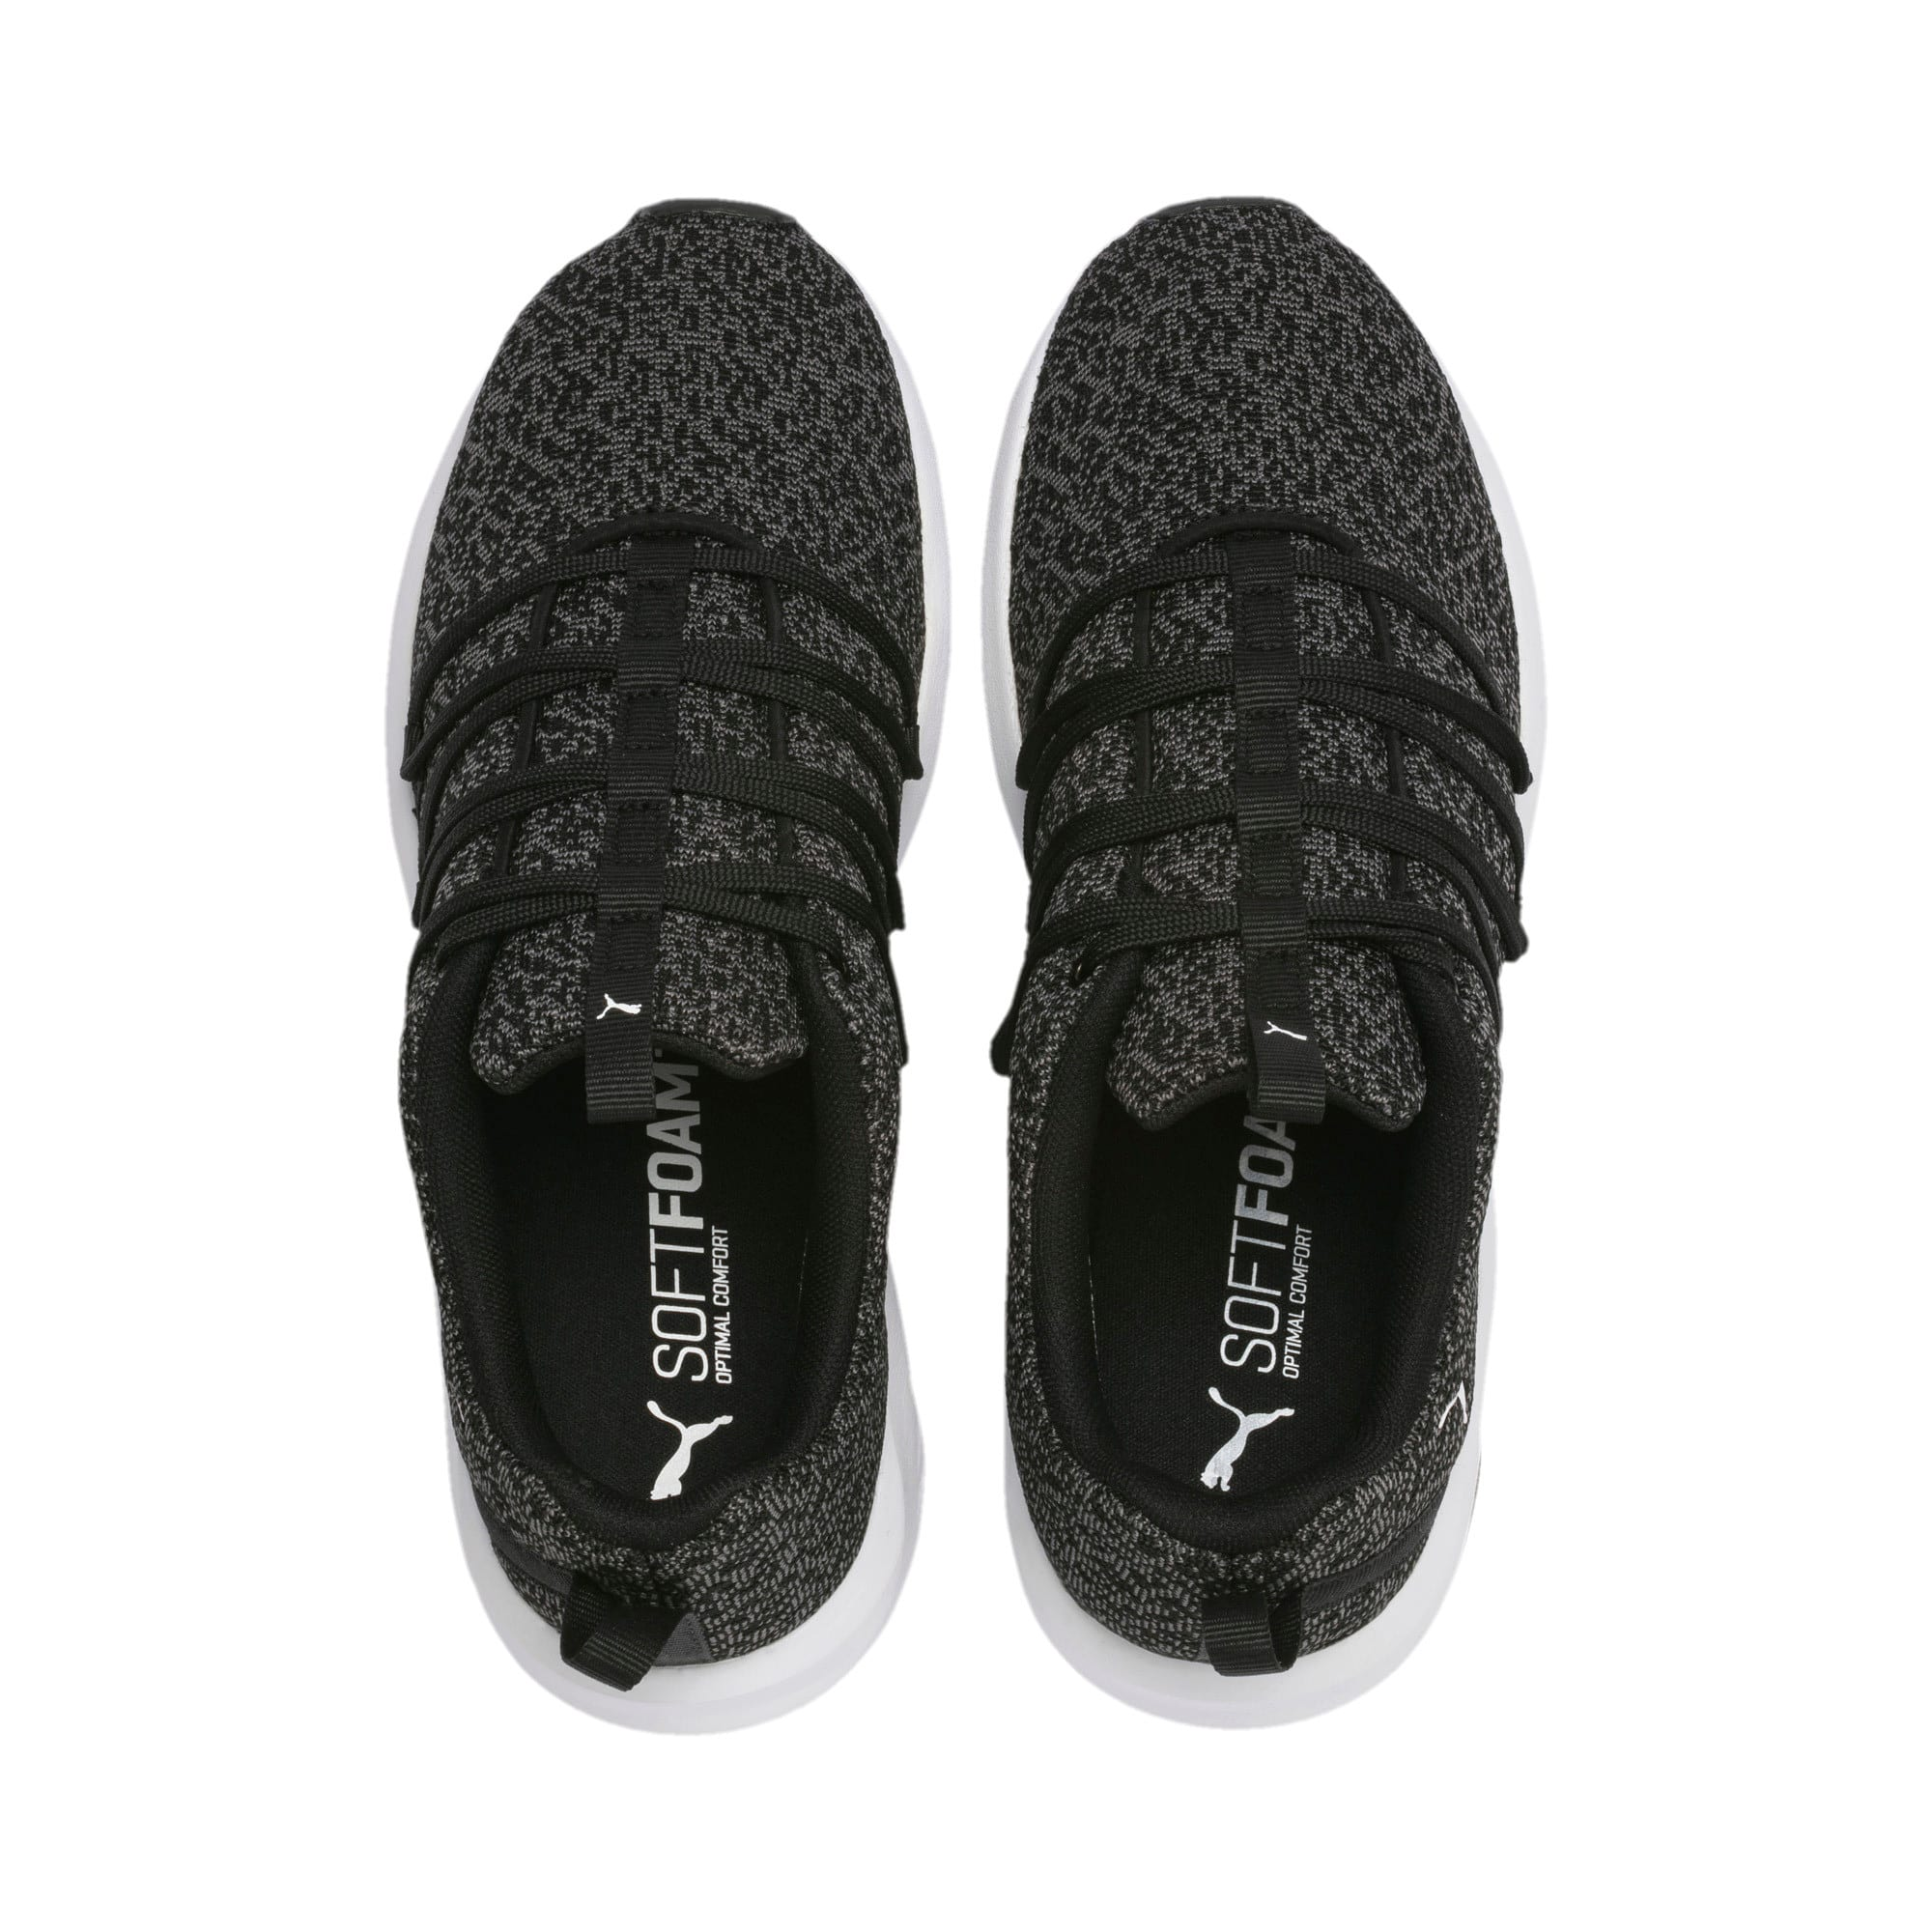 Thumbnail 6 of Prowl Alt Knit Women's Training Shoes, Puma Black-Puma White, medium